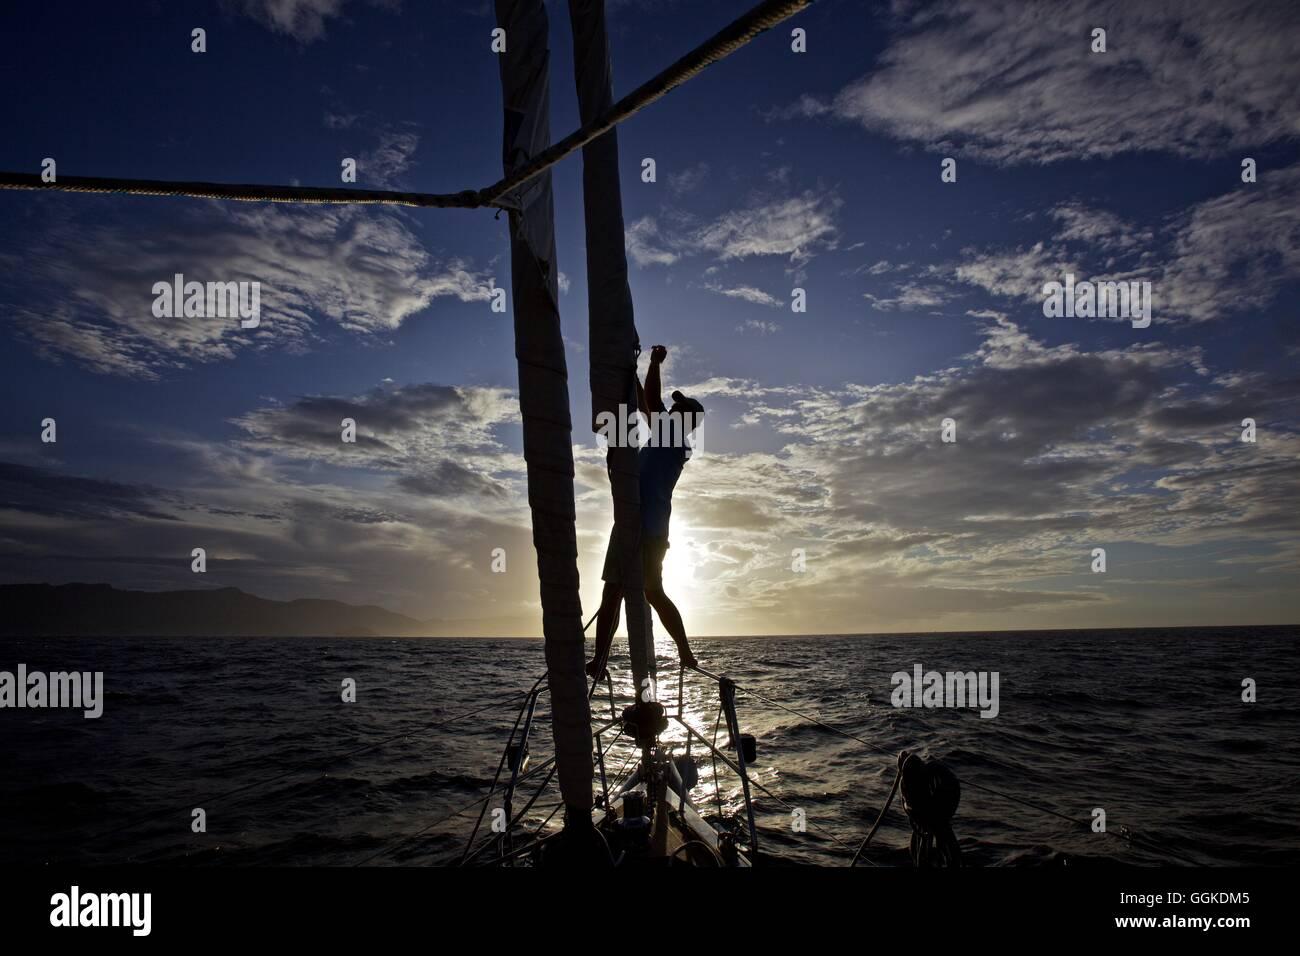 Yachtsman binding back the headsail at sunset, Genoa, Liguria, Italy - Stock Image